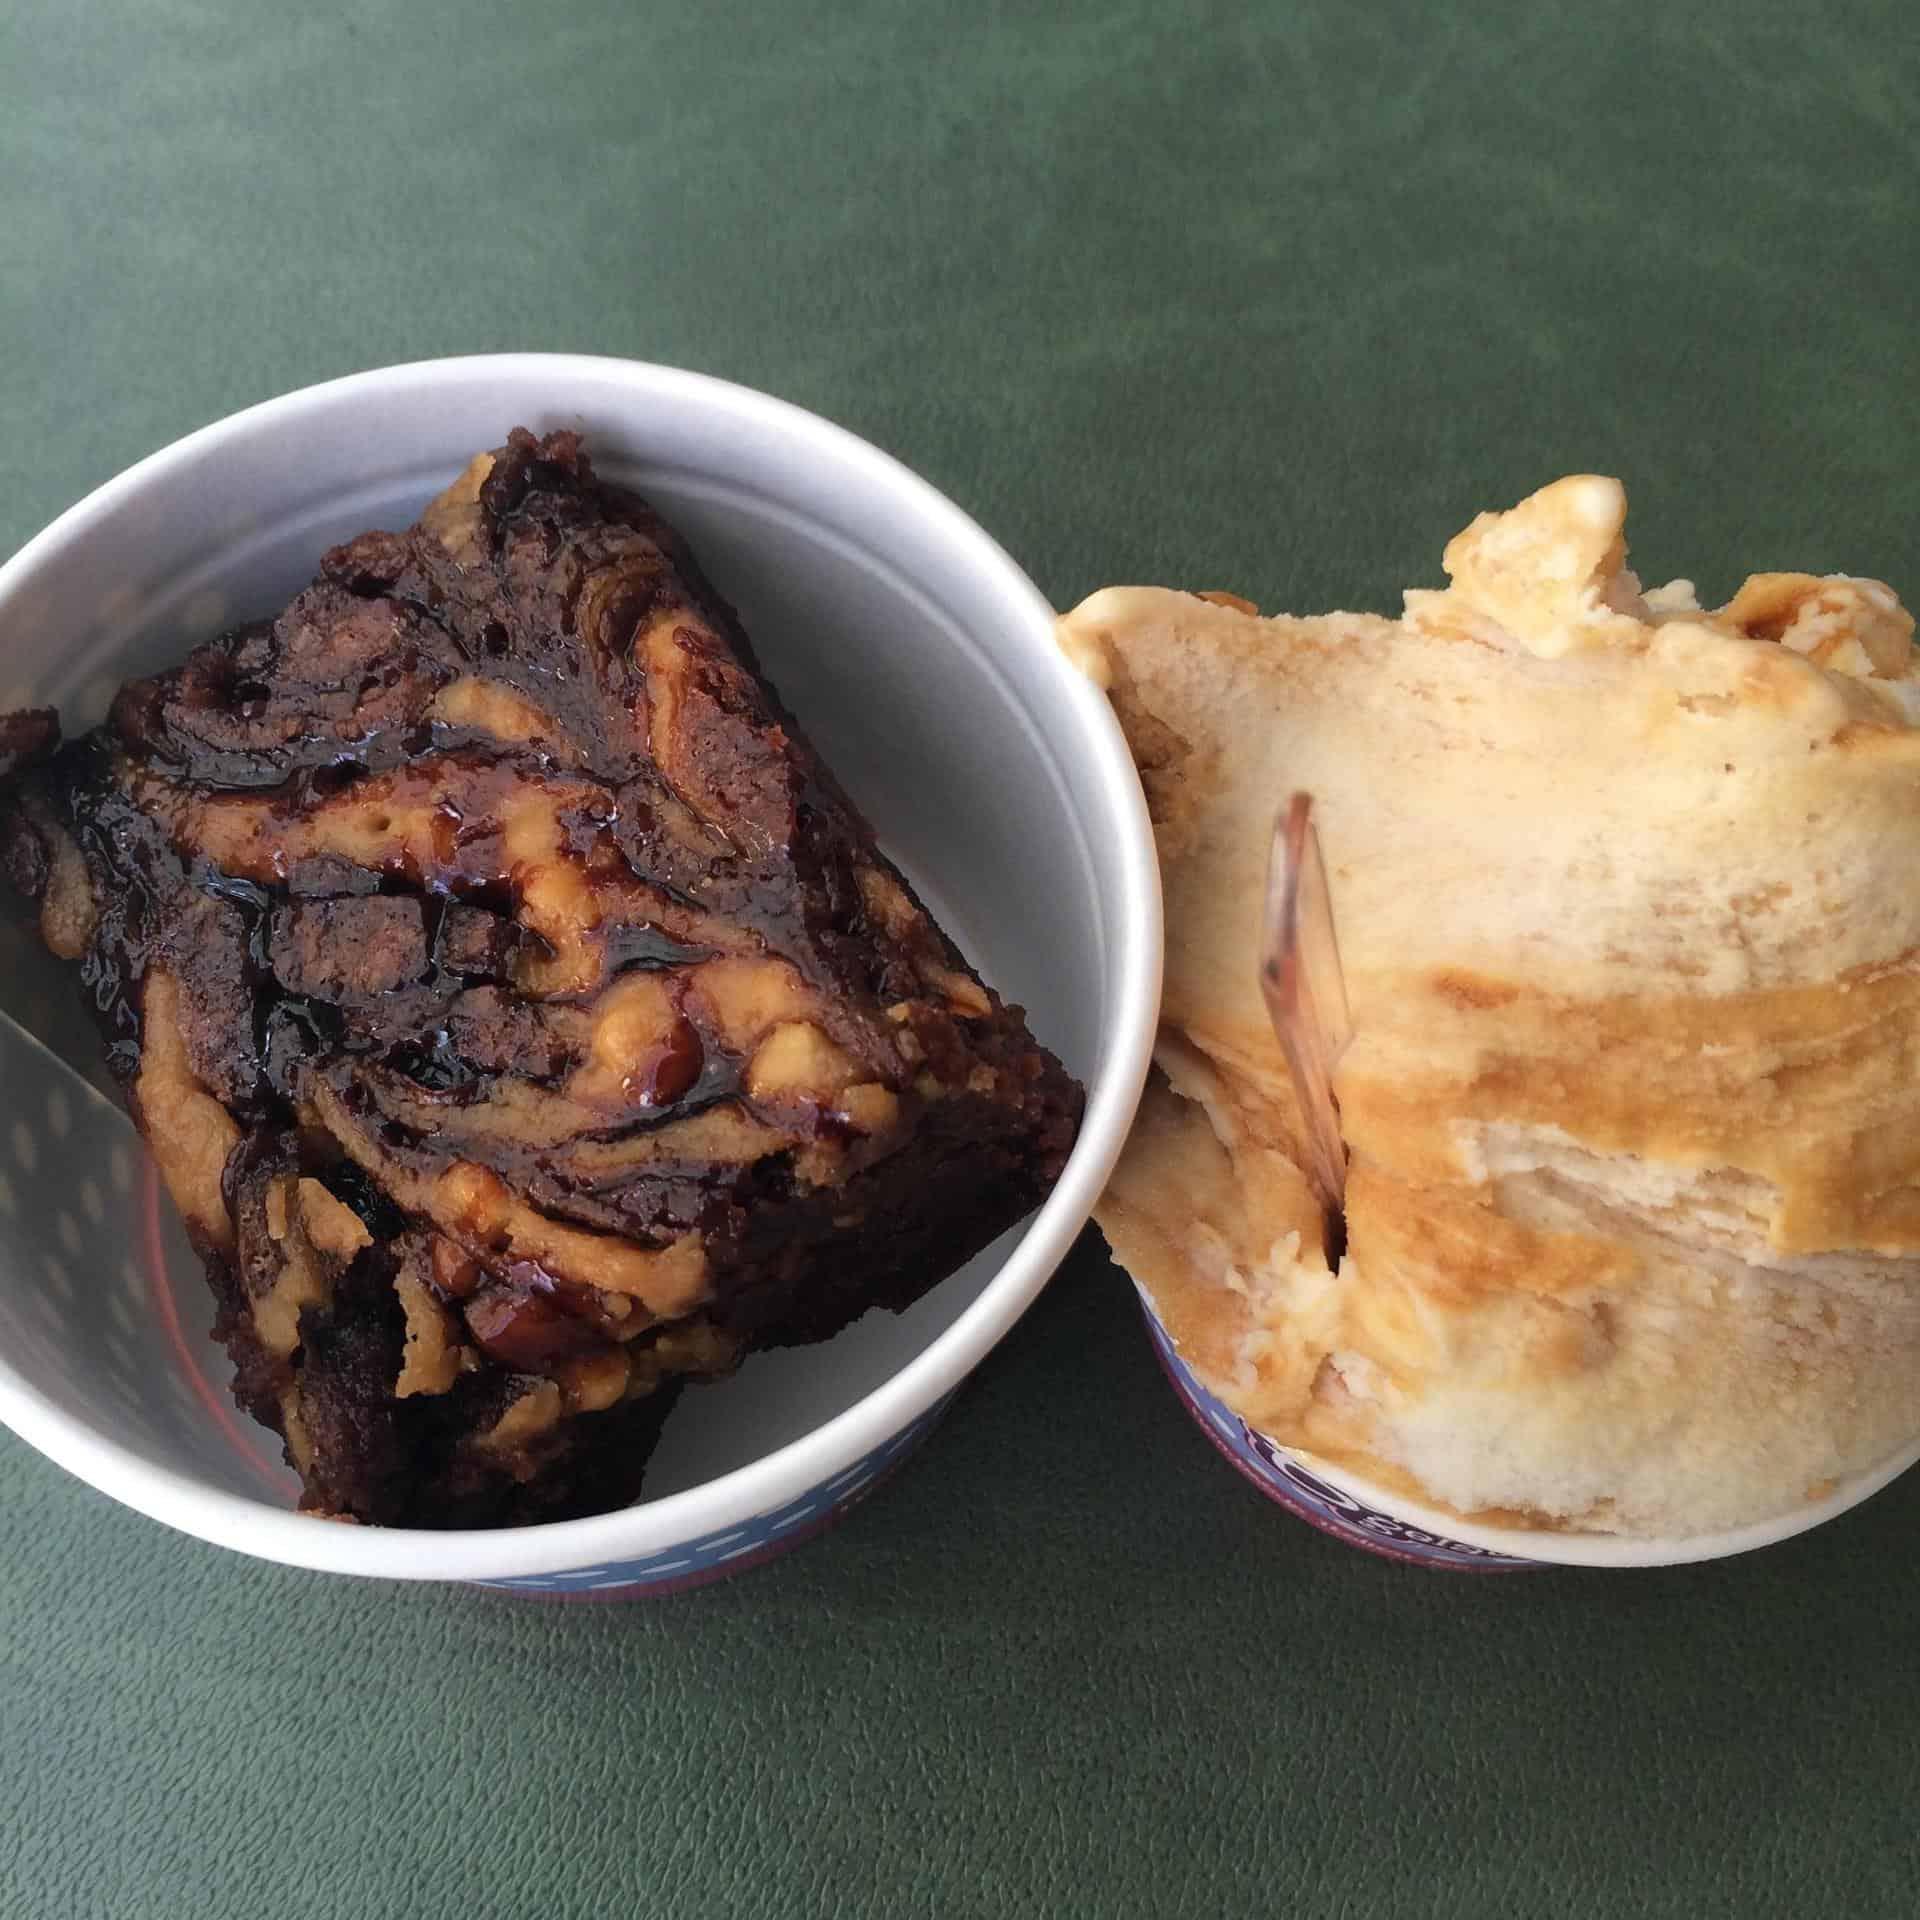 Peanut butter sea salt caramel, Boho Gelato, Brighton